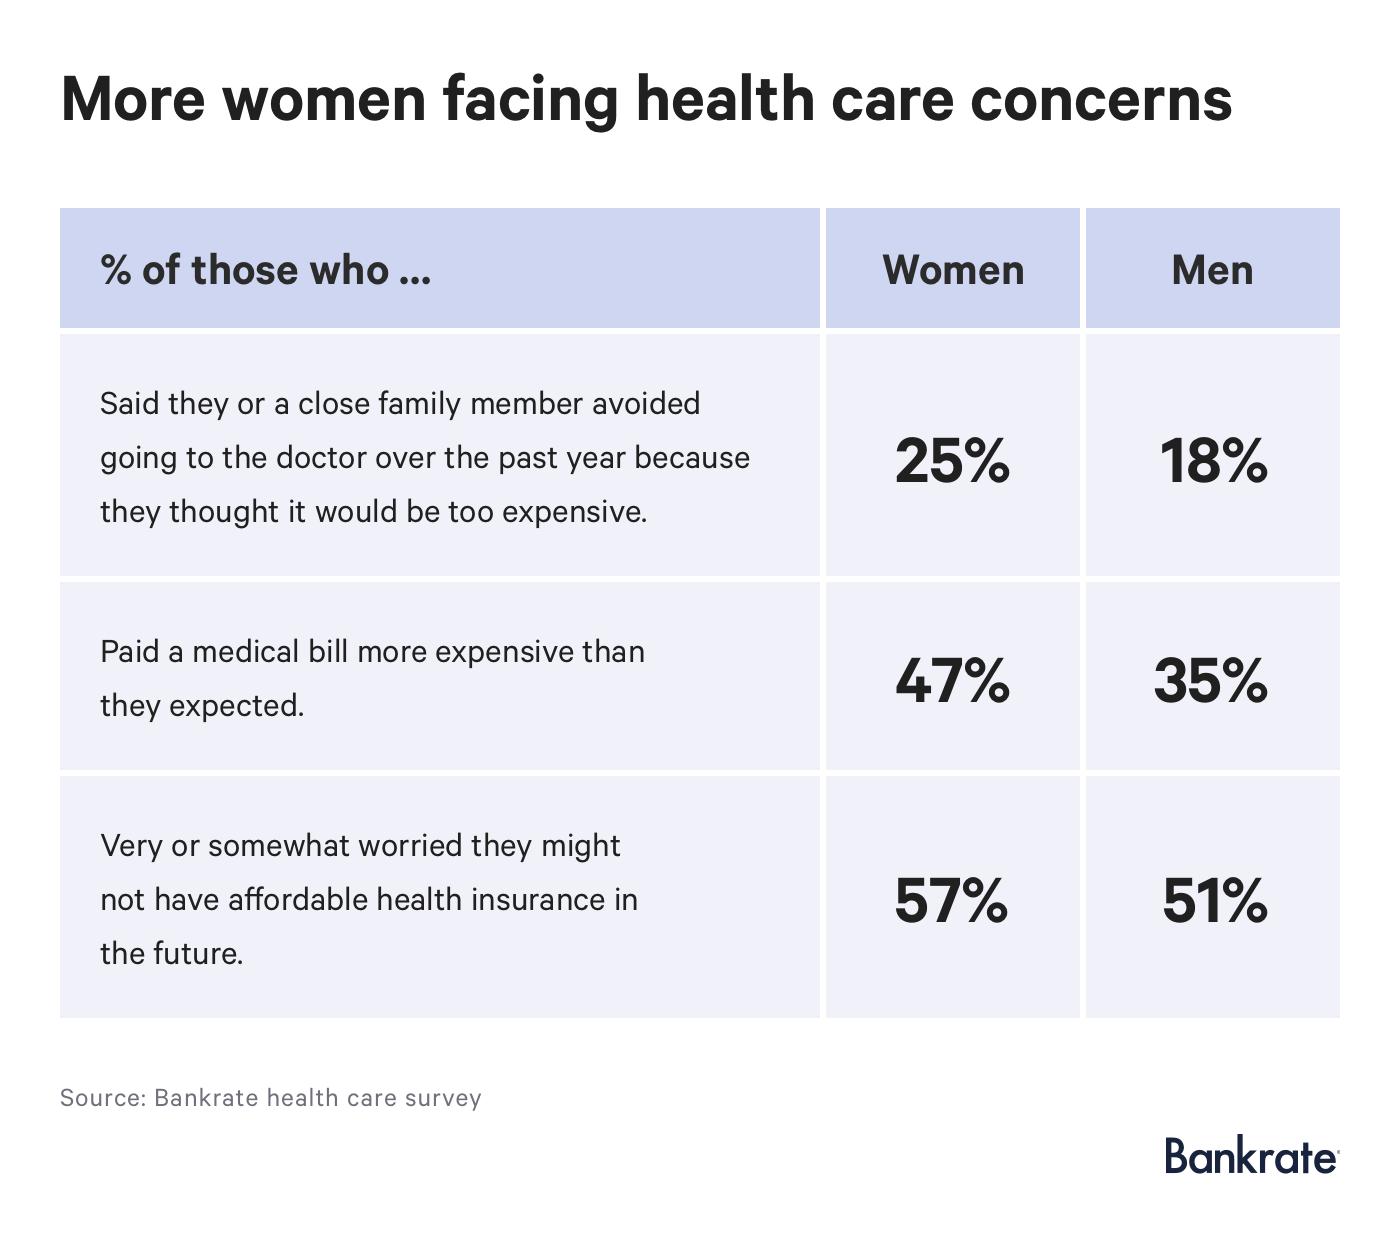 Survey: More women facing health care concerns